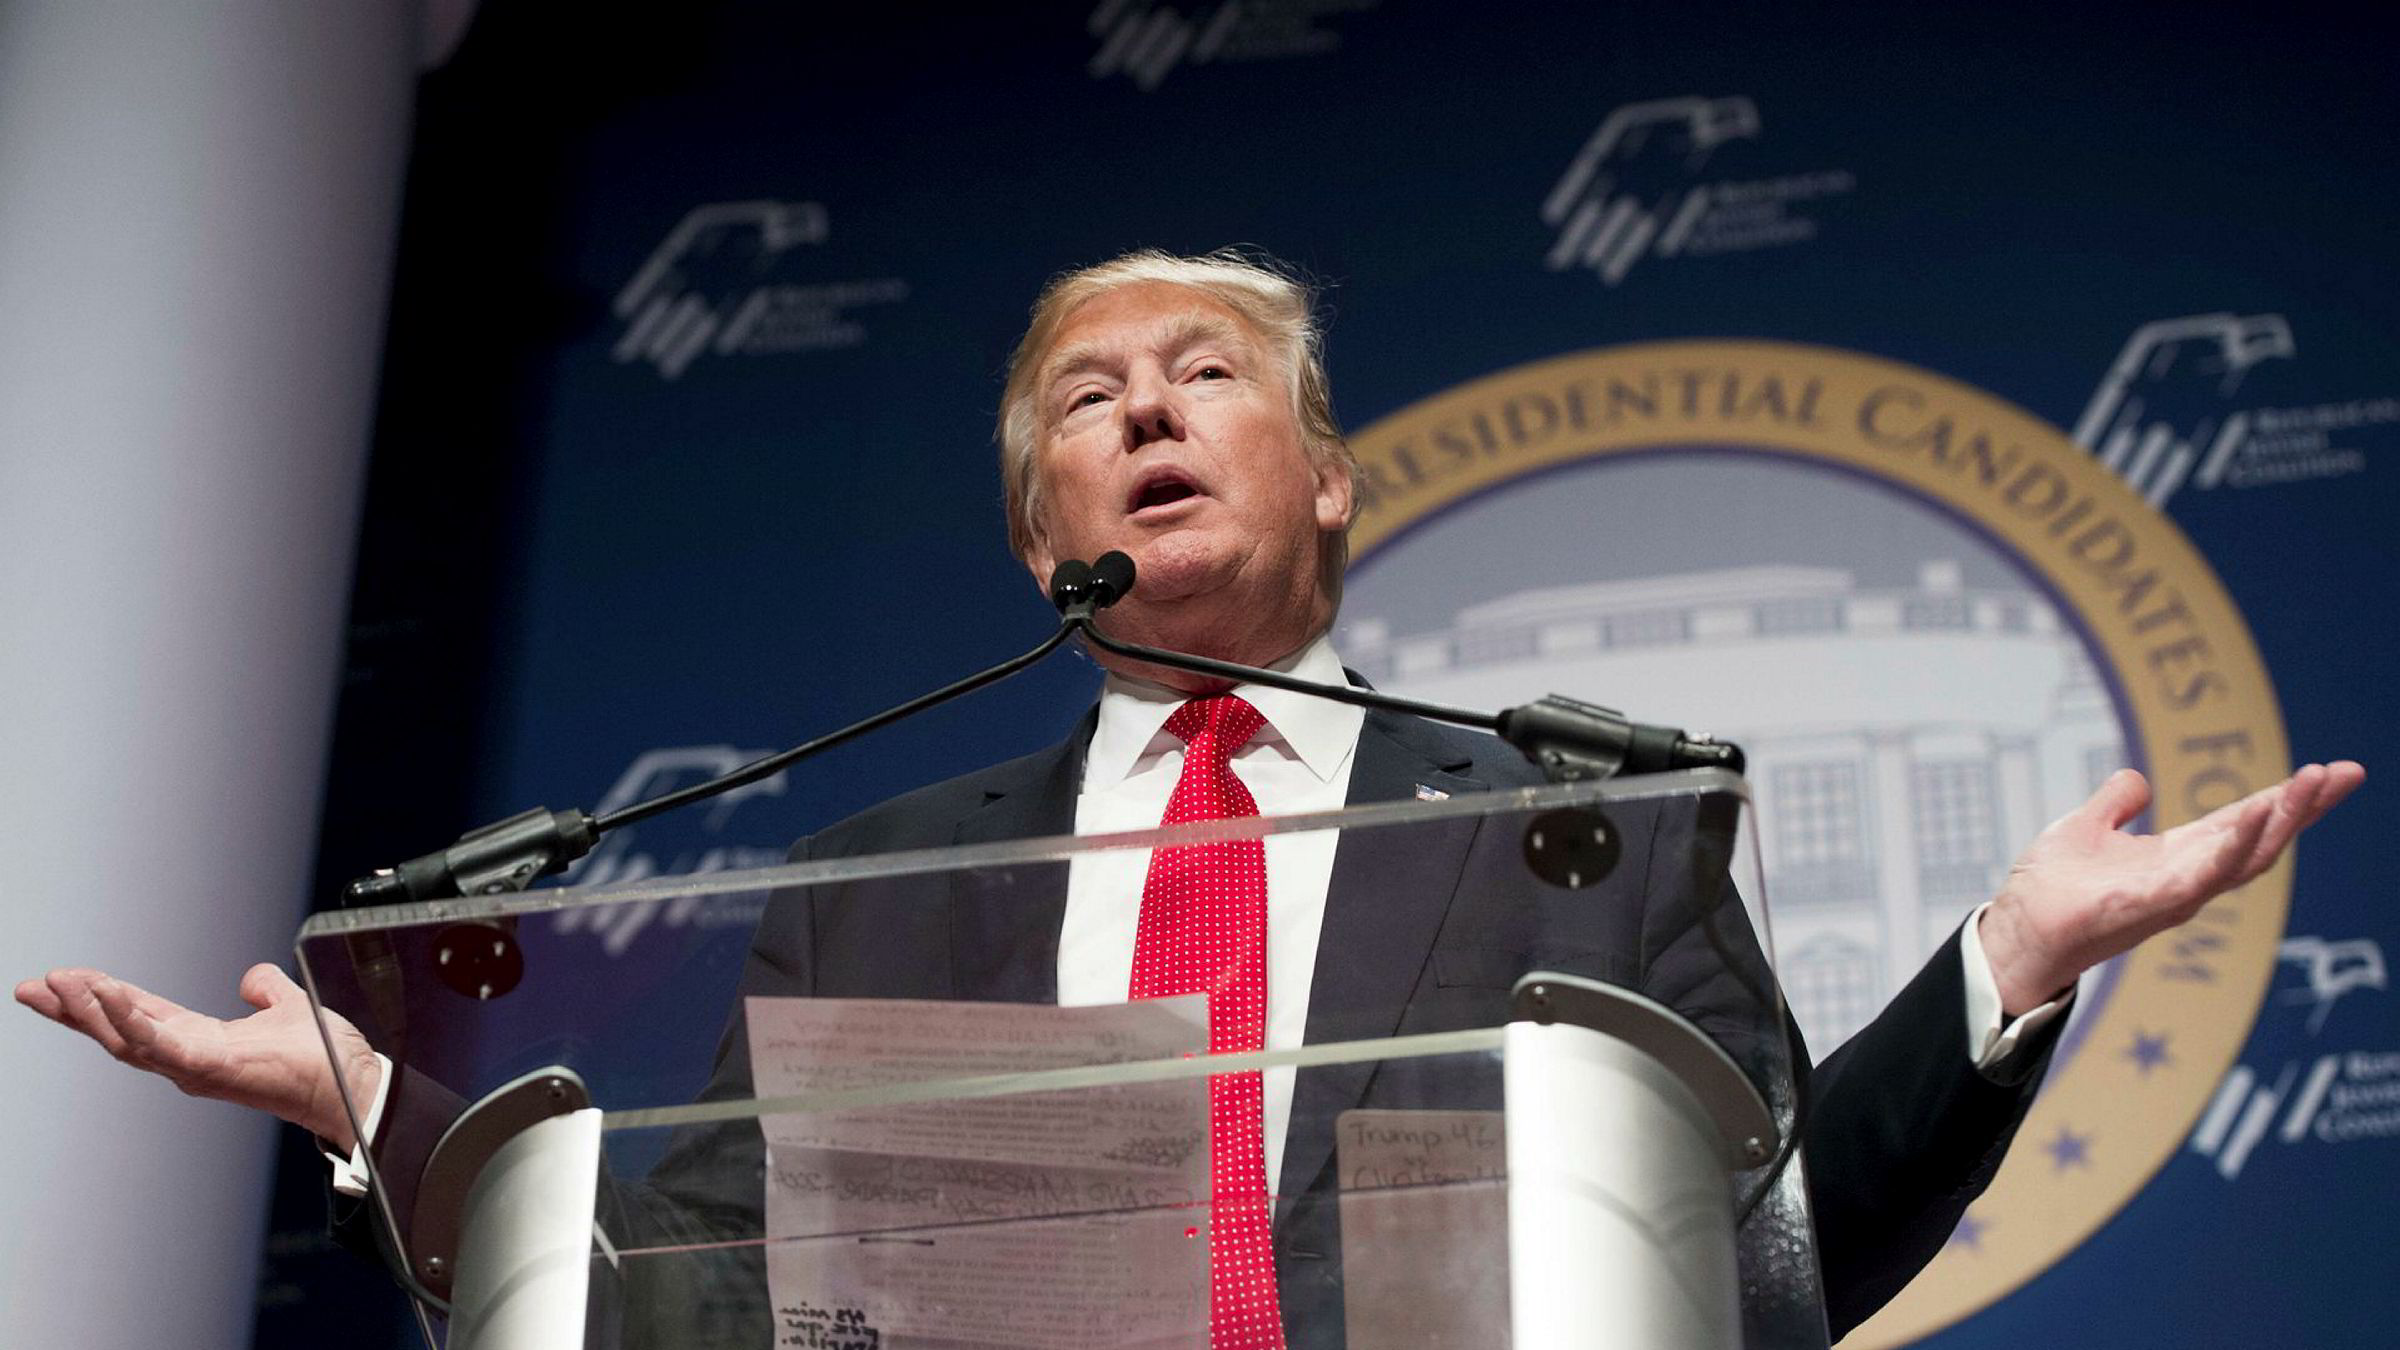 Donald Trumps lege sier Trump dikterte sin egen legeerklæring.